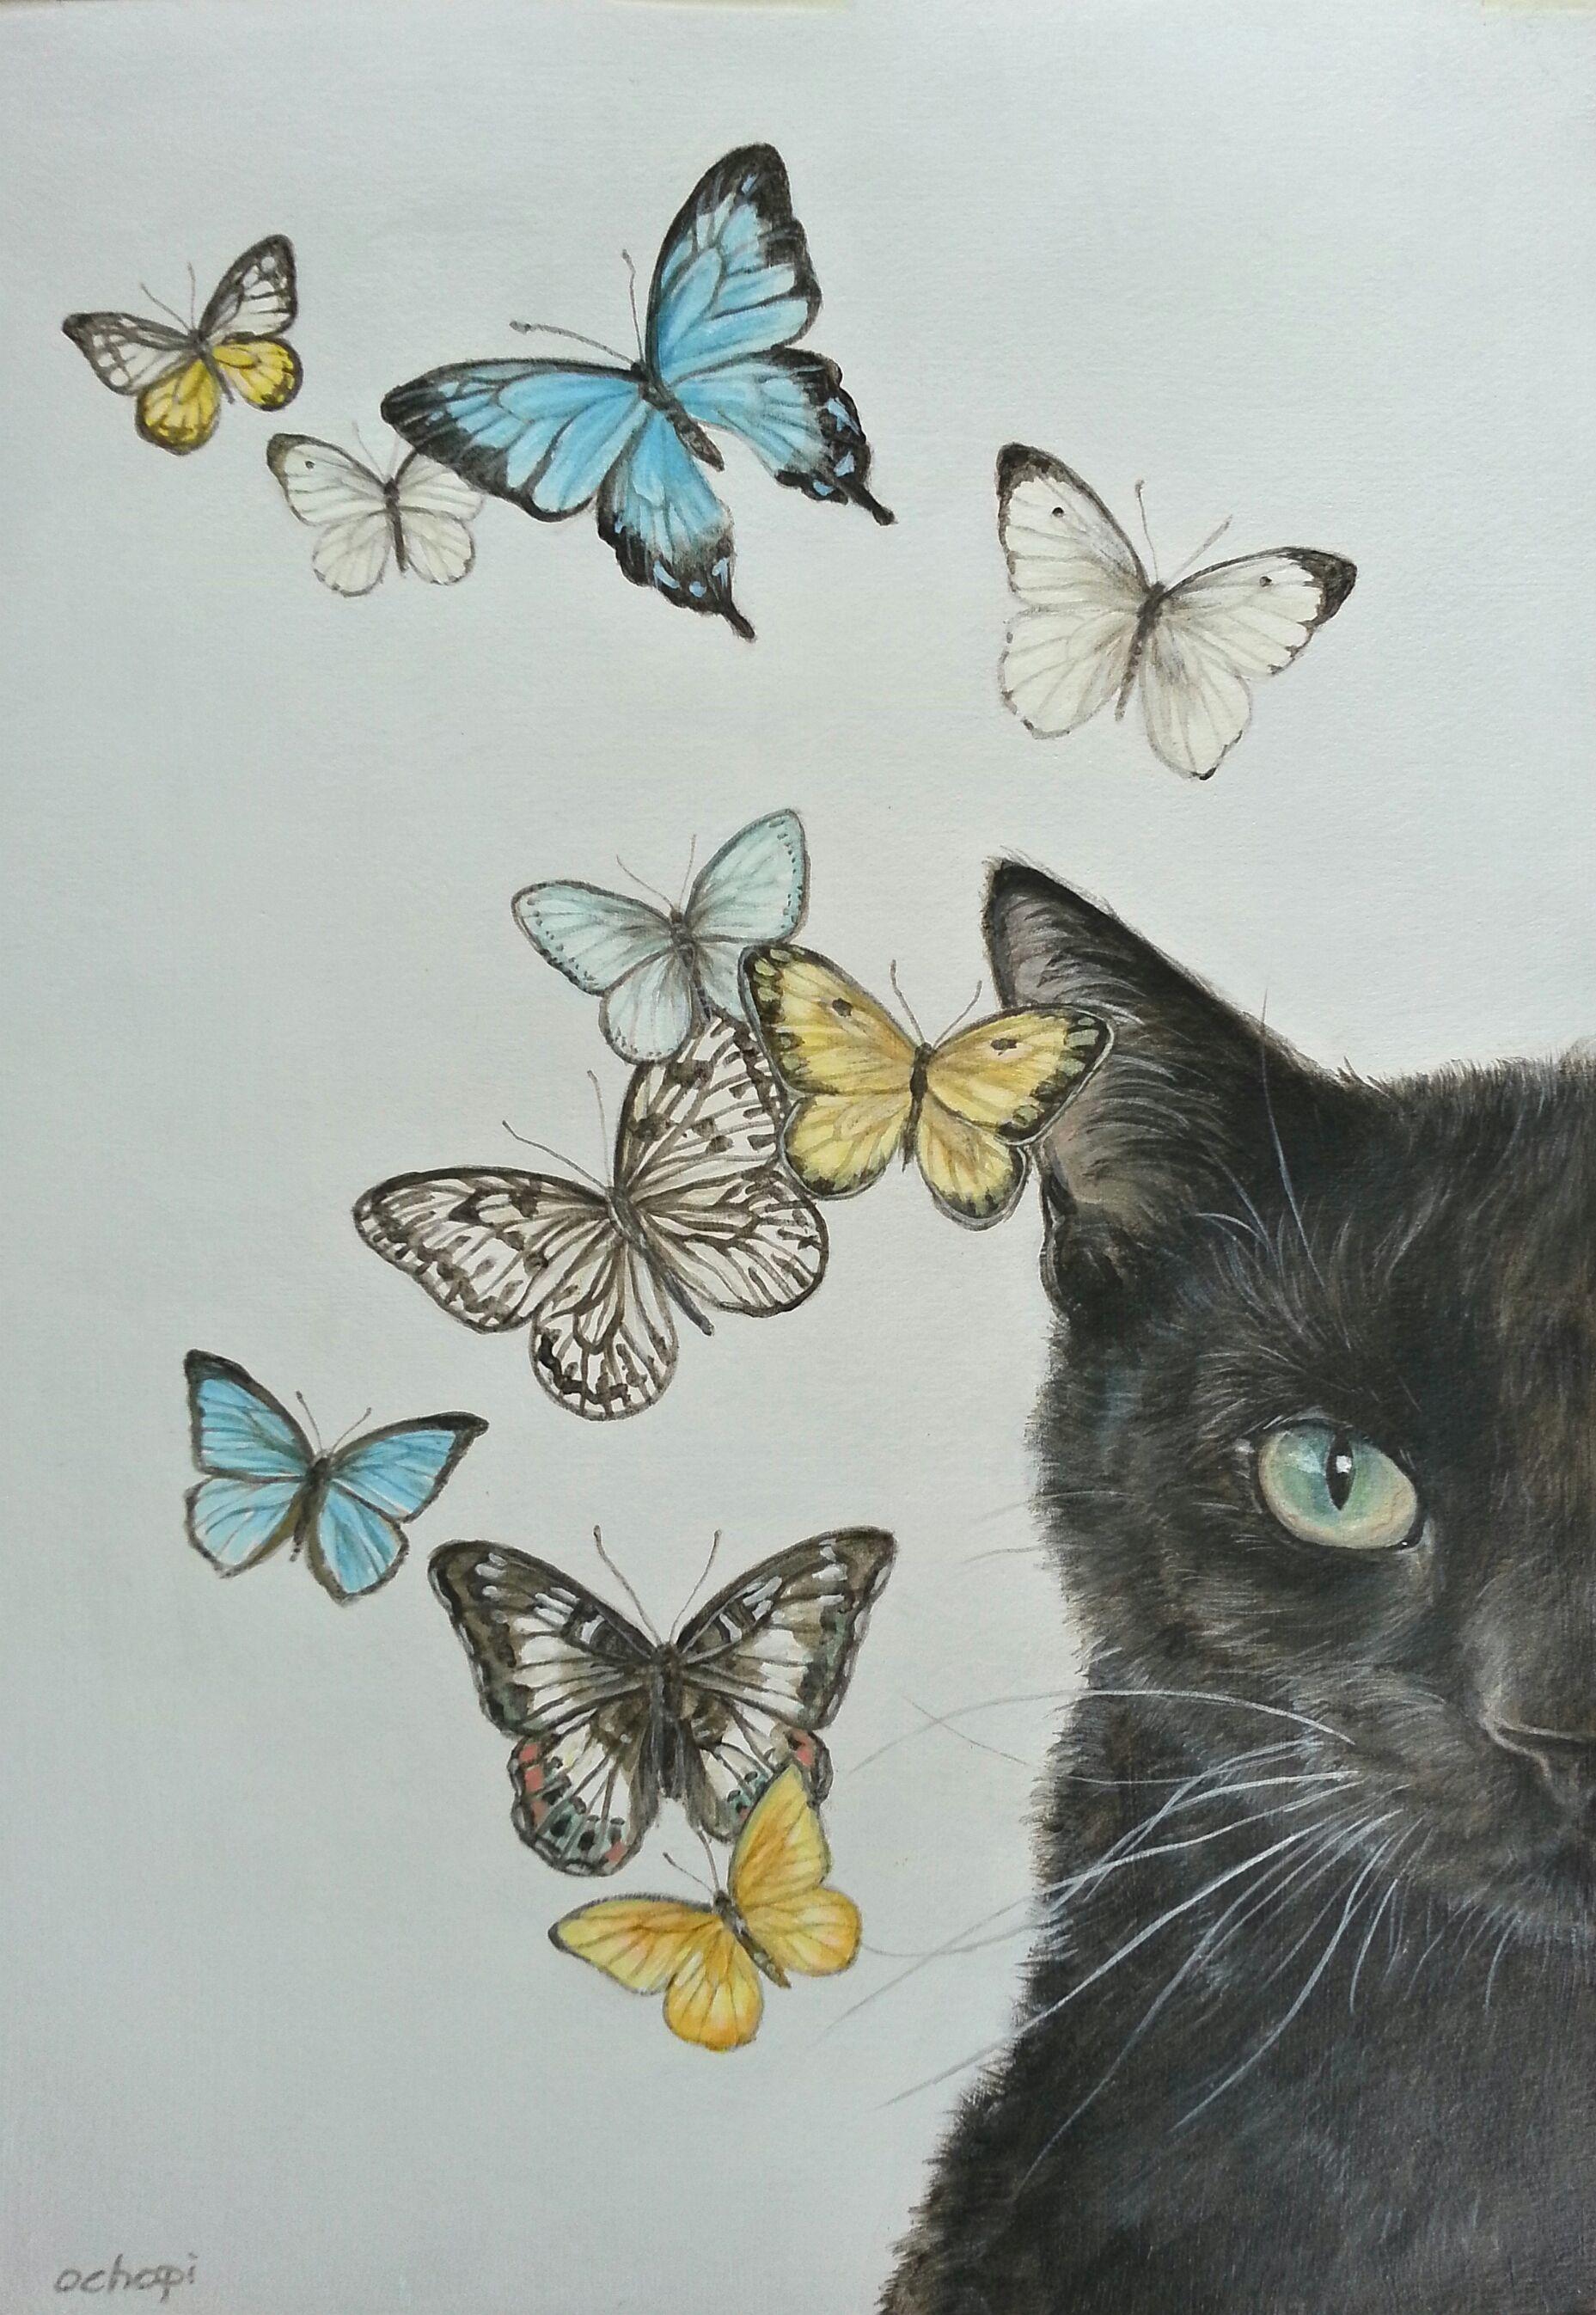 Fantastic Wallpaper Cat Butterfly - d6b288032b4c61a2021c65c35c965557  Best Photo Reference_47585 .jpg